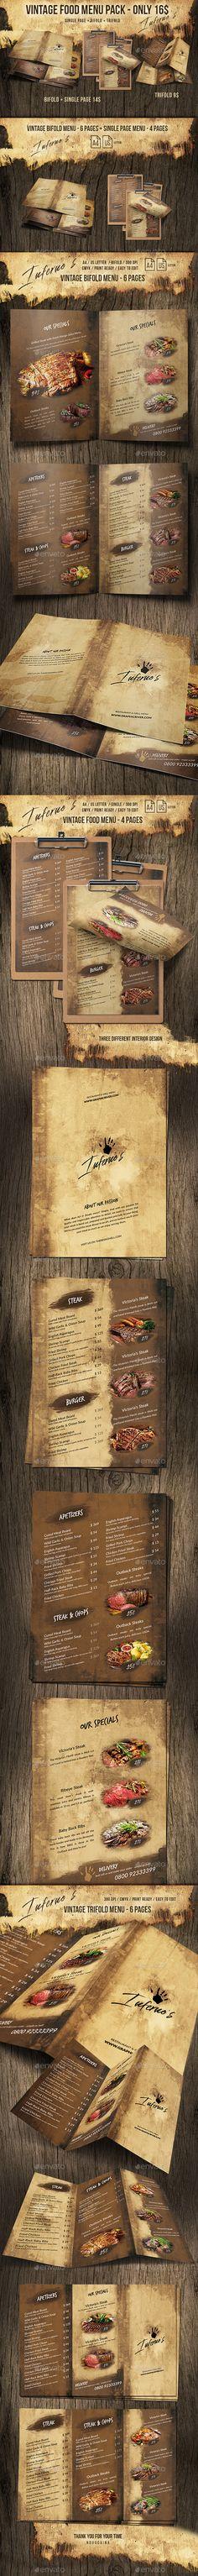 Infernos Vintage Menu Bundle — Photoshop PSD #cool #minimalist menu • Available here ➝ https://graphicriver.net/item/infernos-vintage-menu-bundle/20646418?ref=pxcr